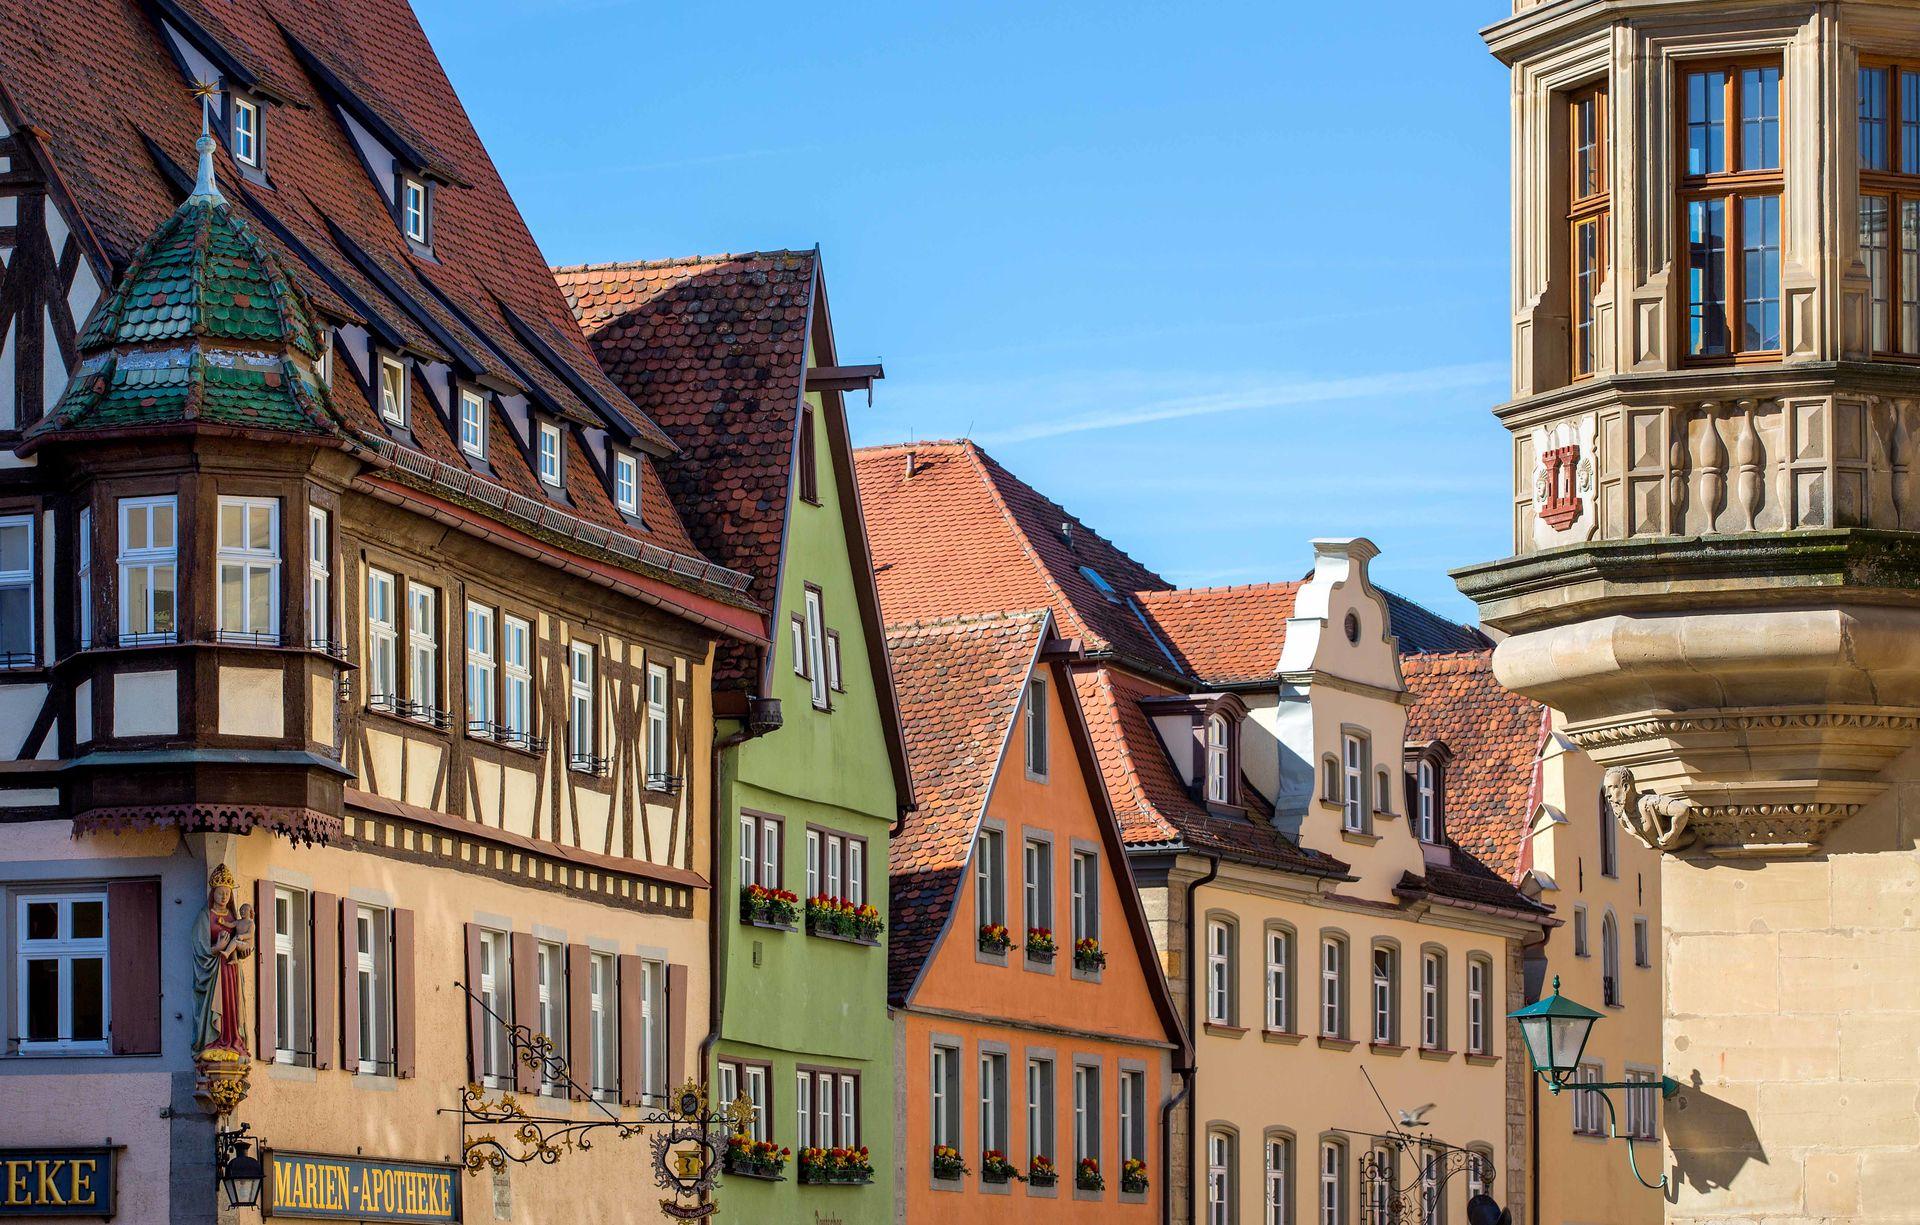 © Rothenburg Tourismus Service, W. Pfitzinger